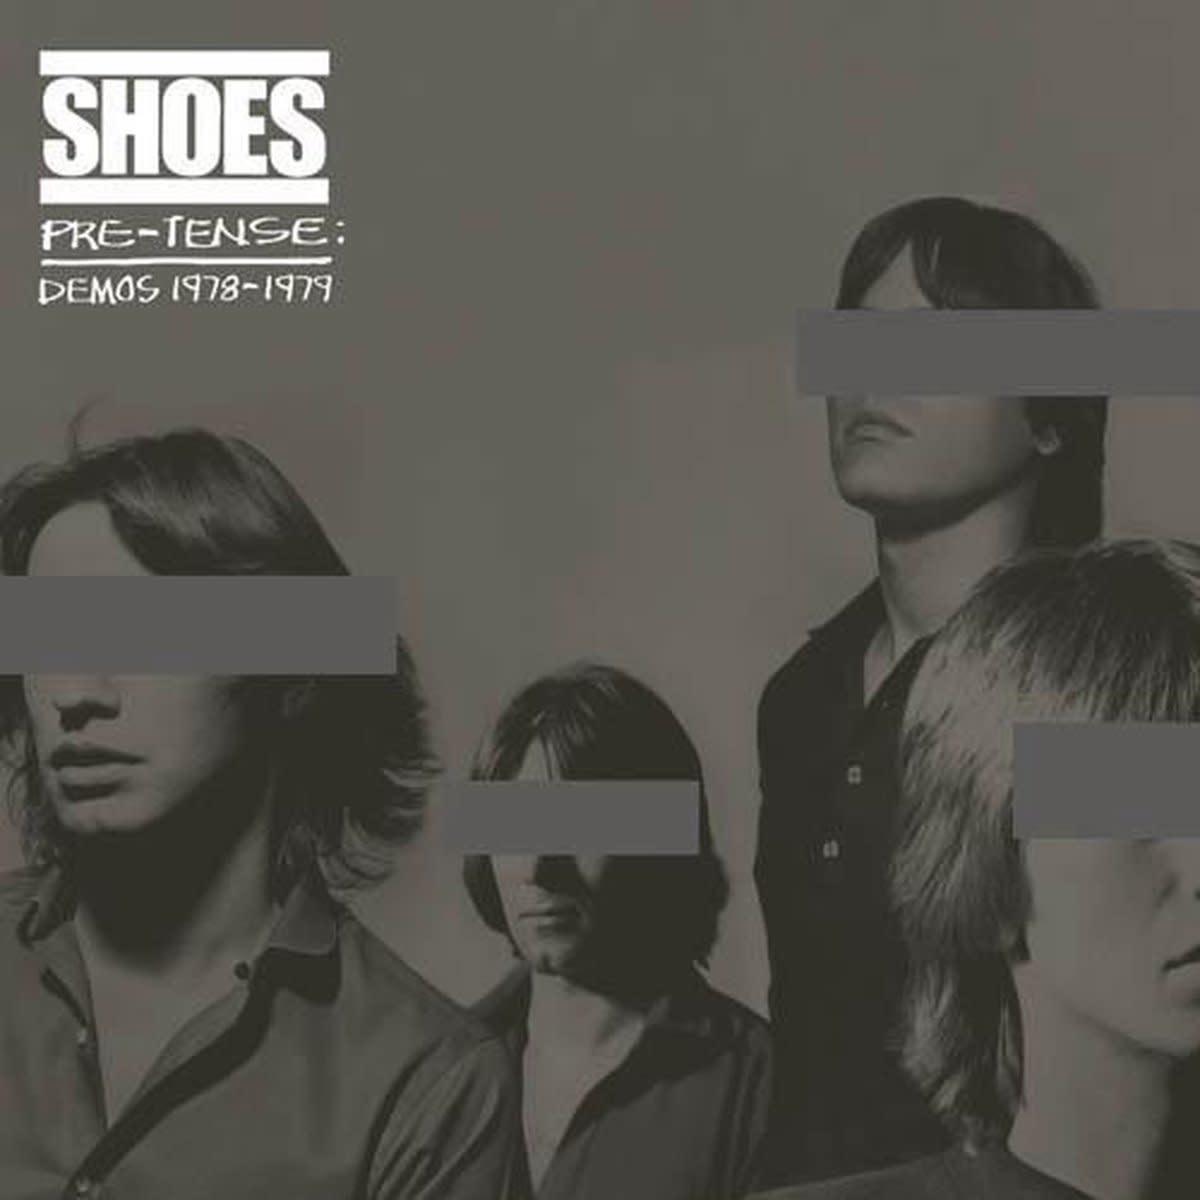 Numero Group Shoes - Pre-Tense: Demos 1978-1979